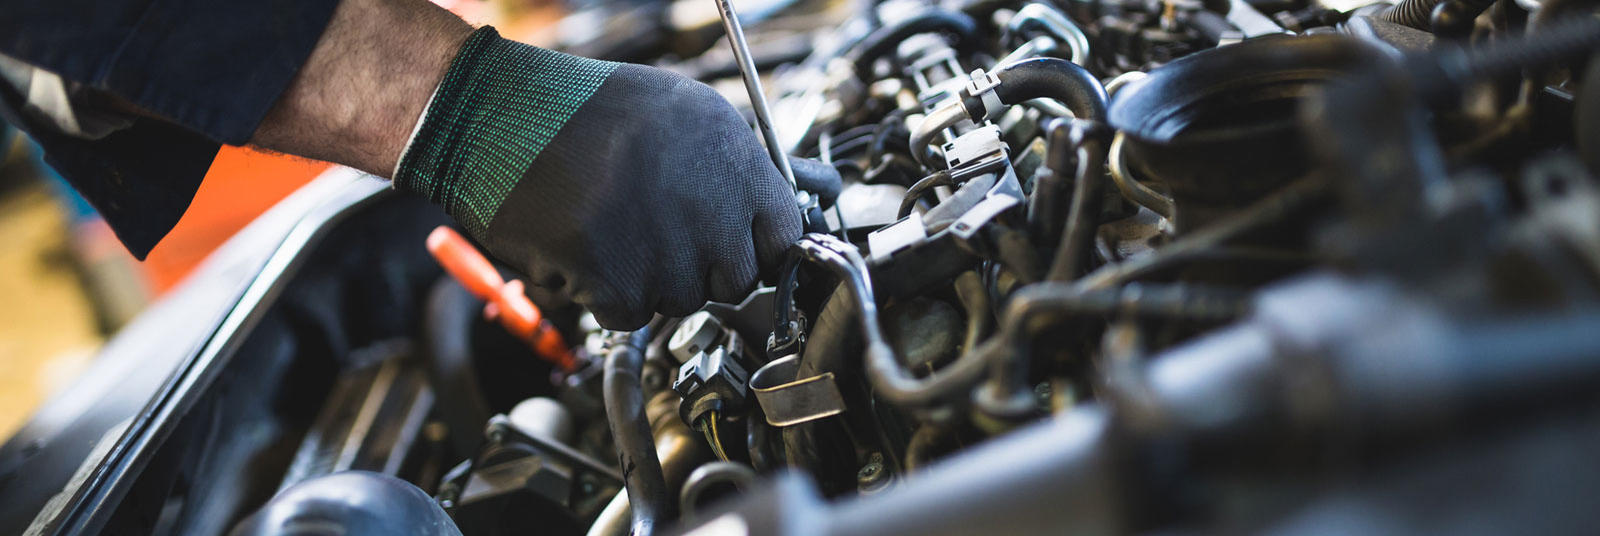 diy car maintenance course manchester